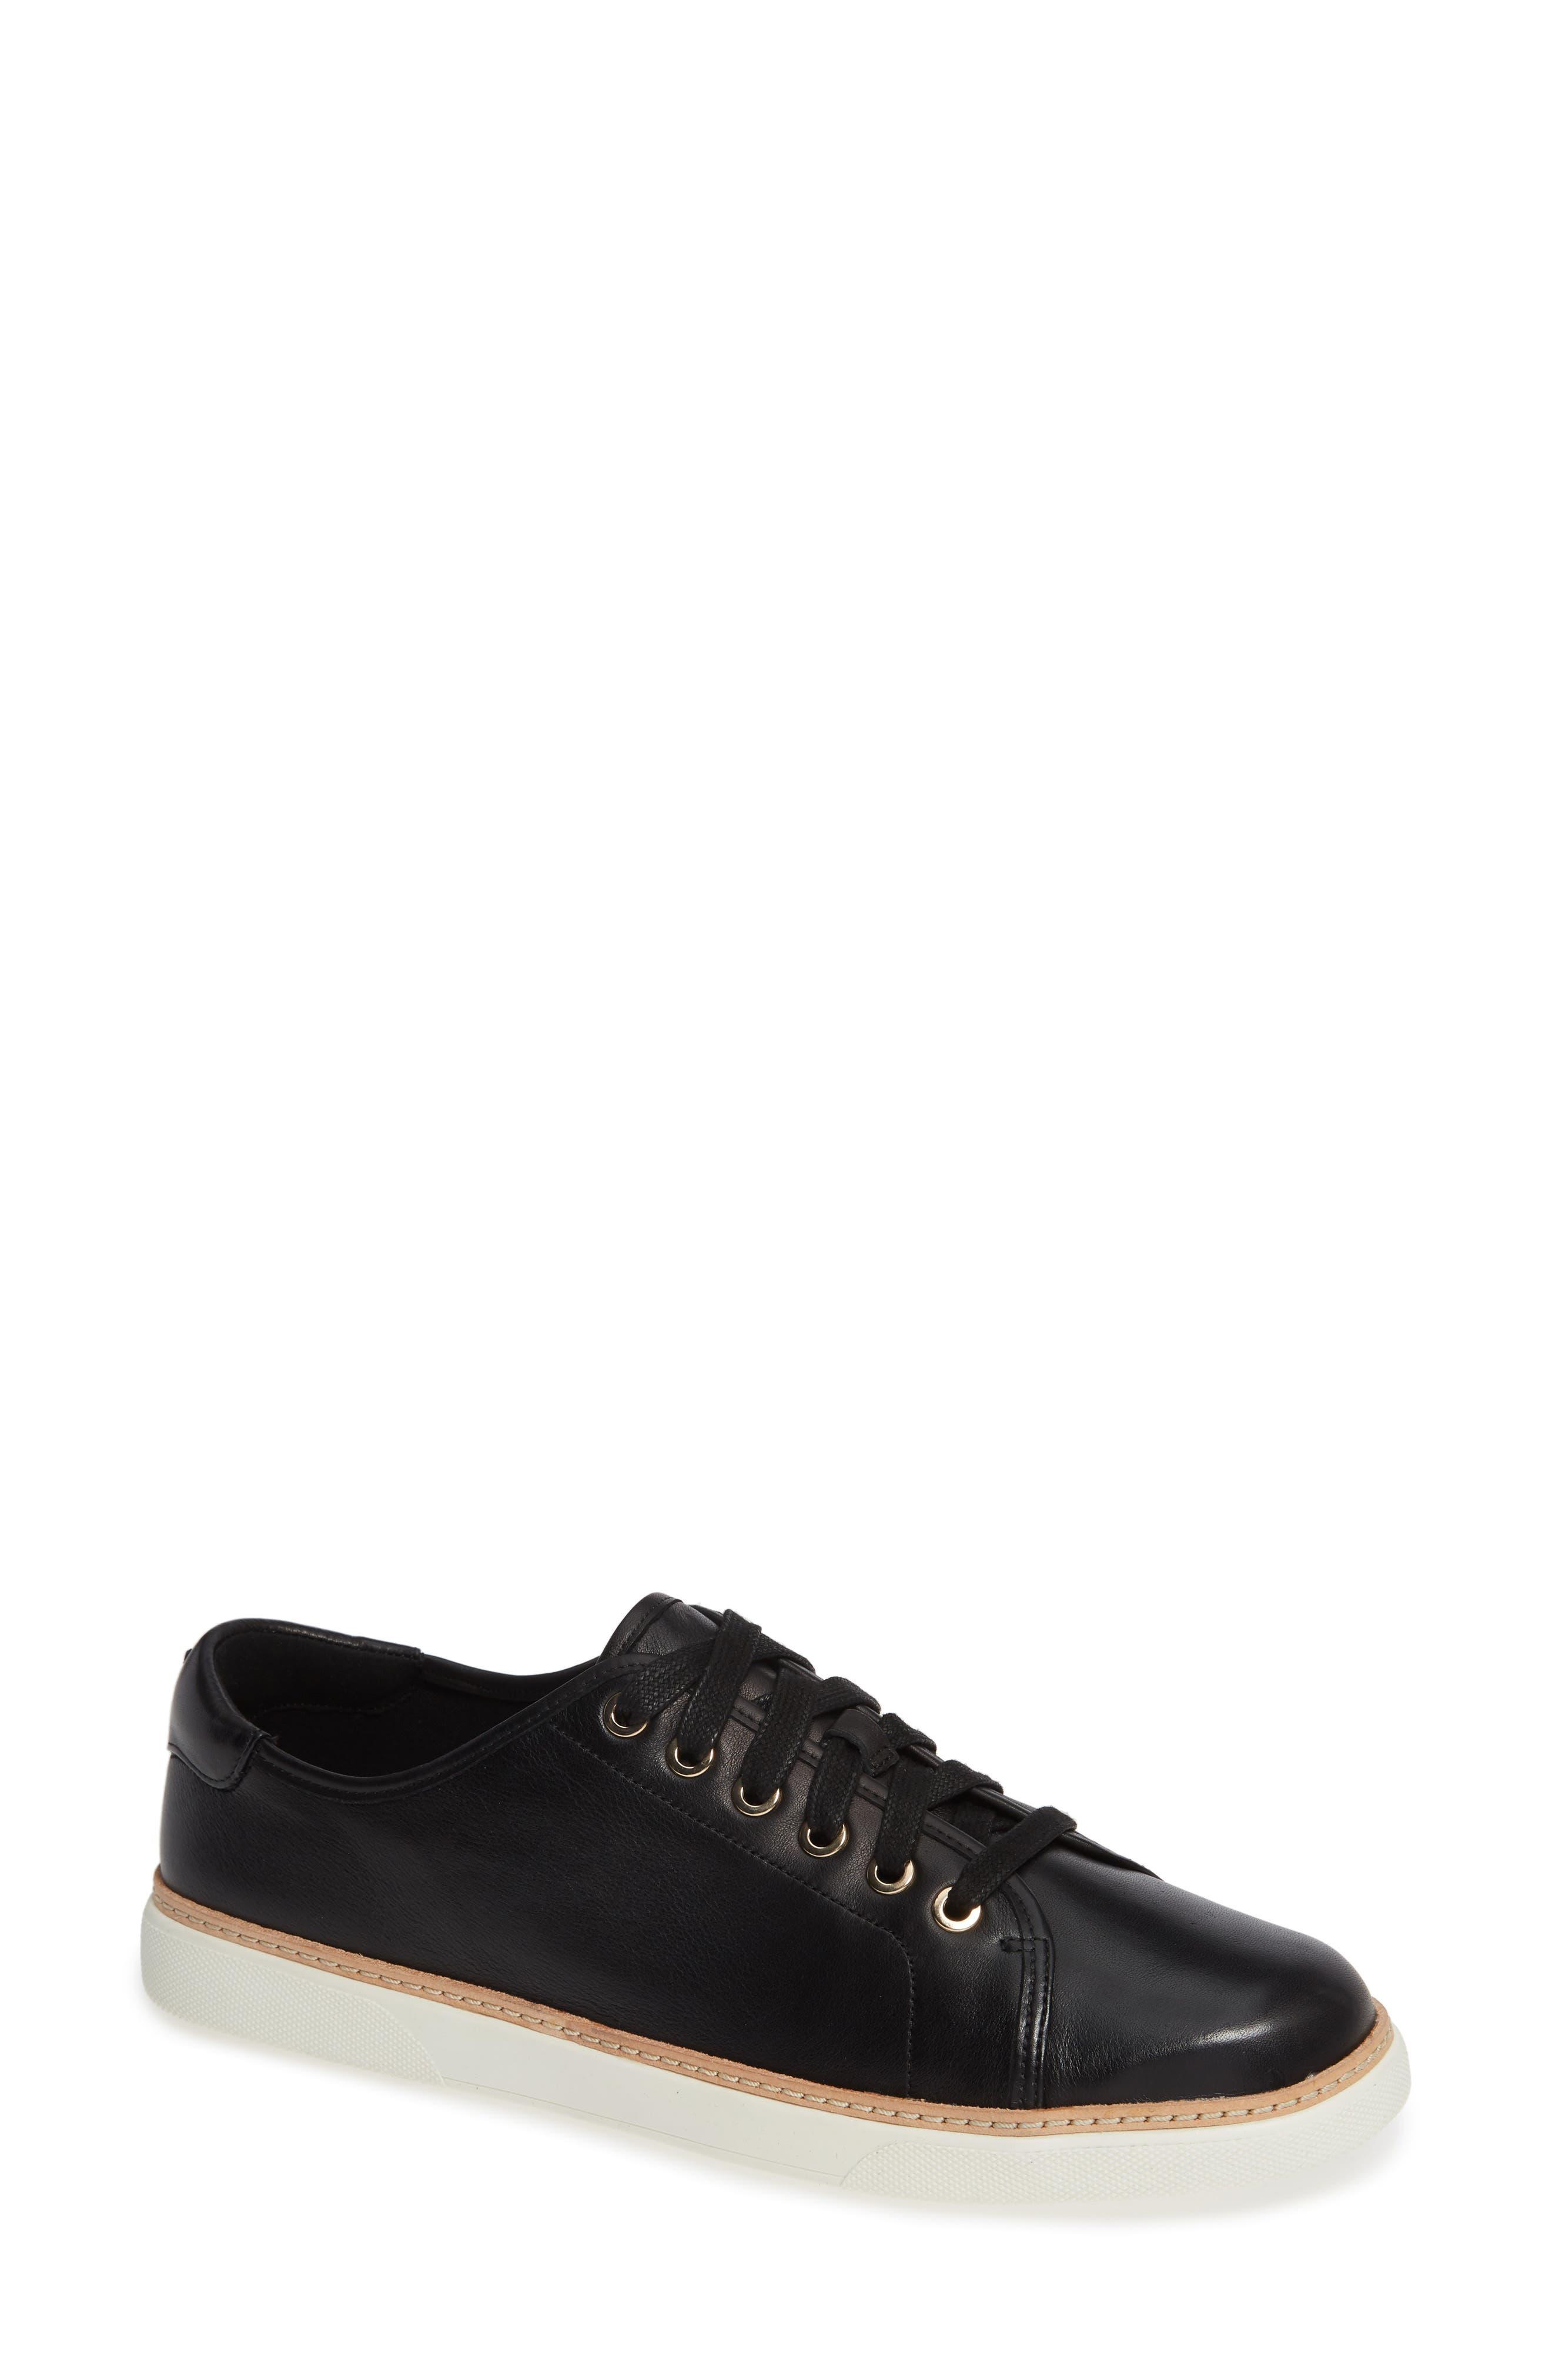 Leah Sneaker,                             Main thumbnail 1, color,                             BLACK LEATHER